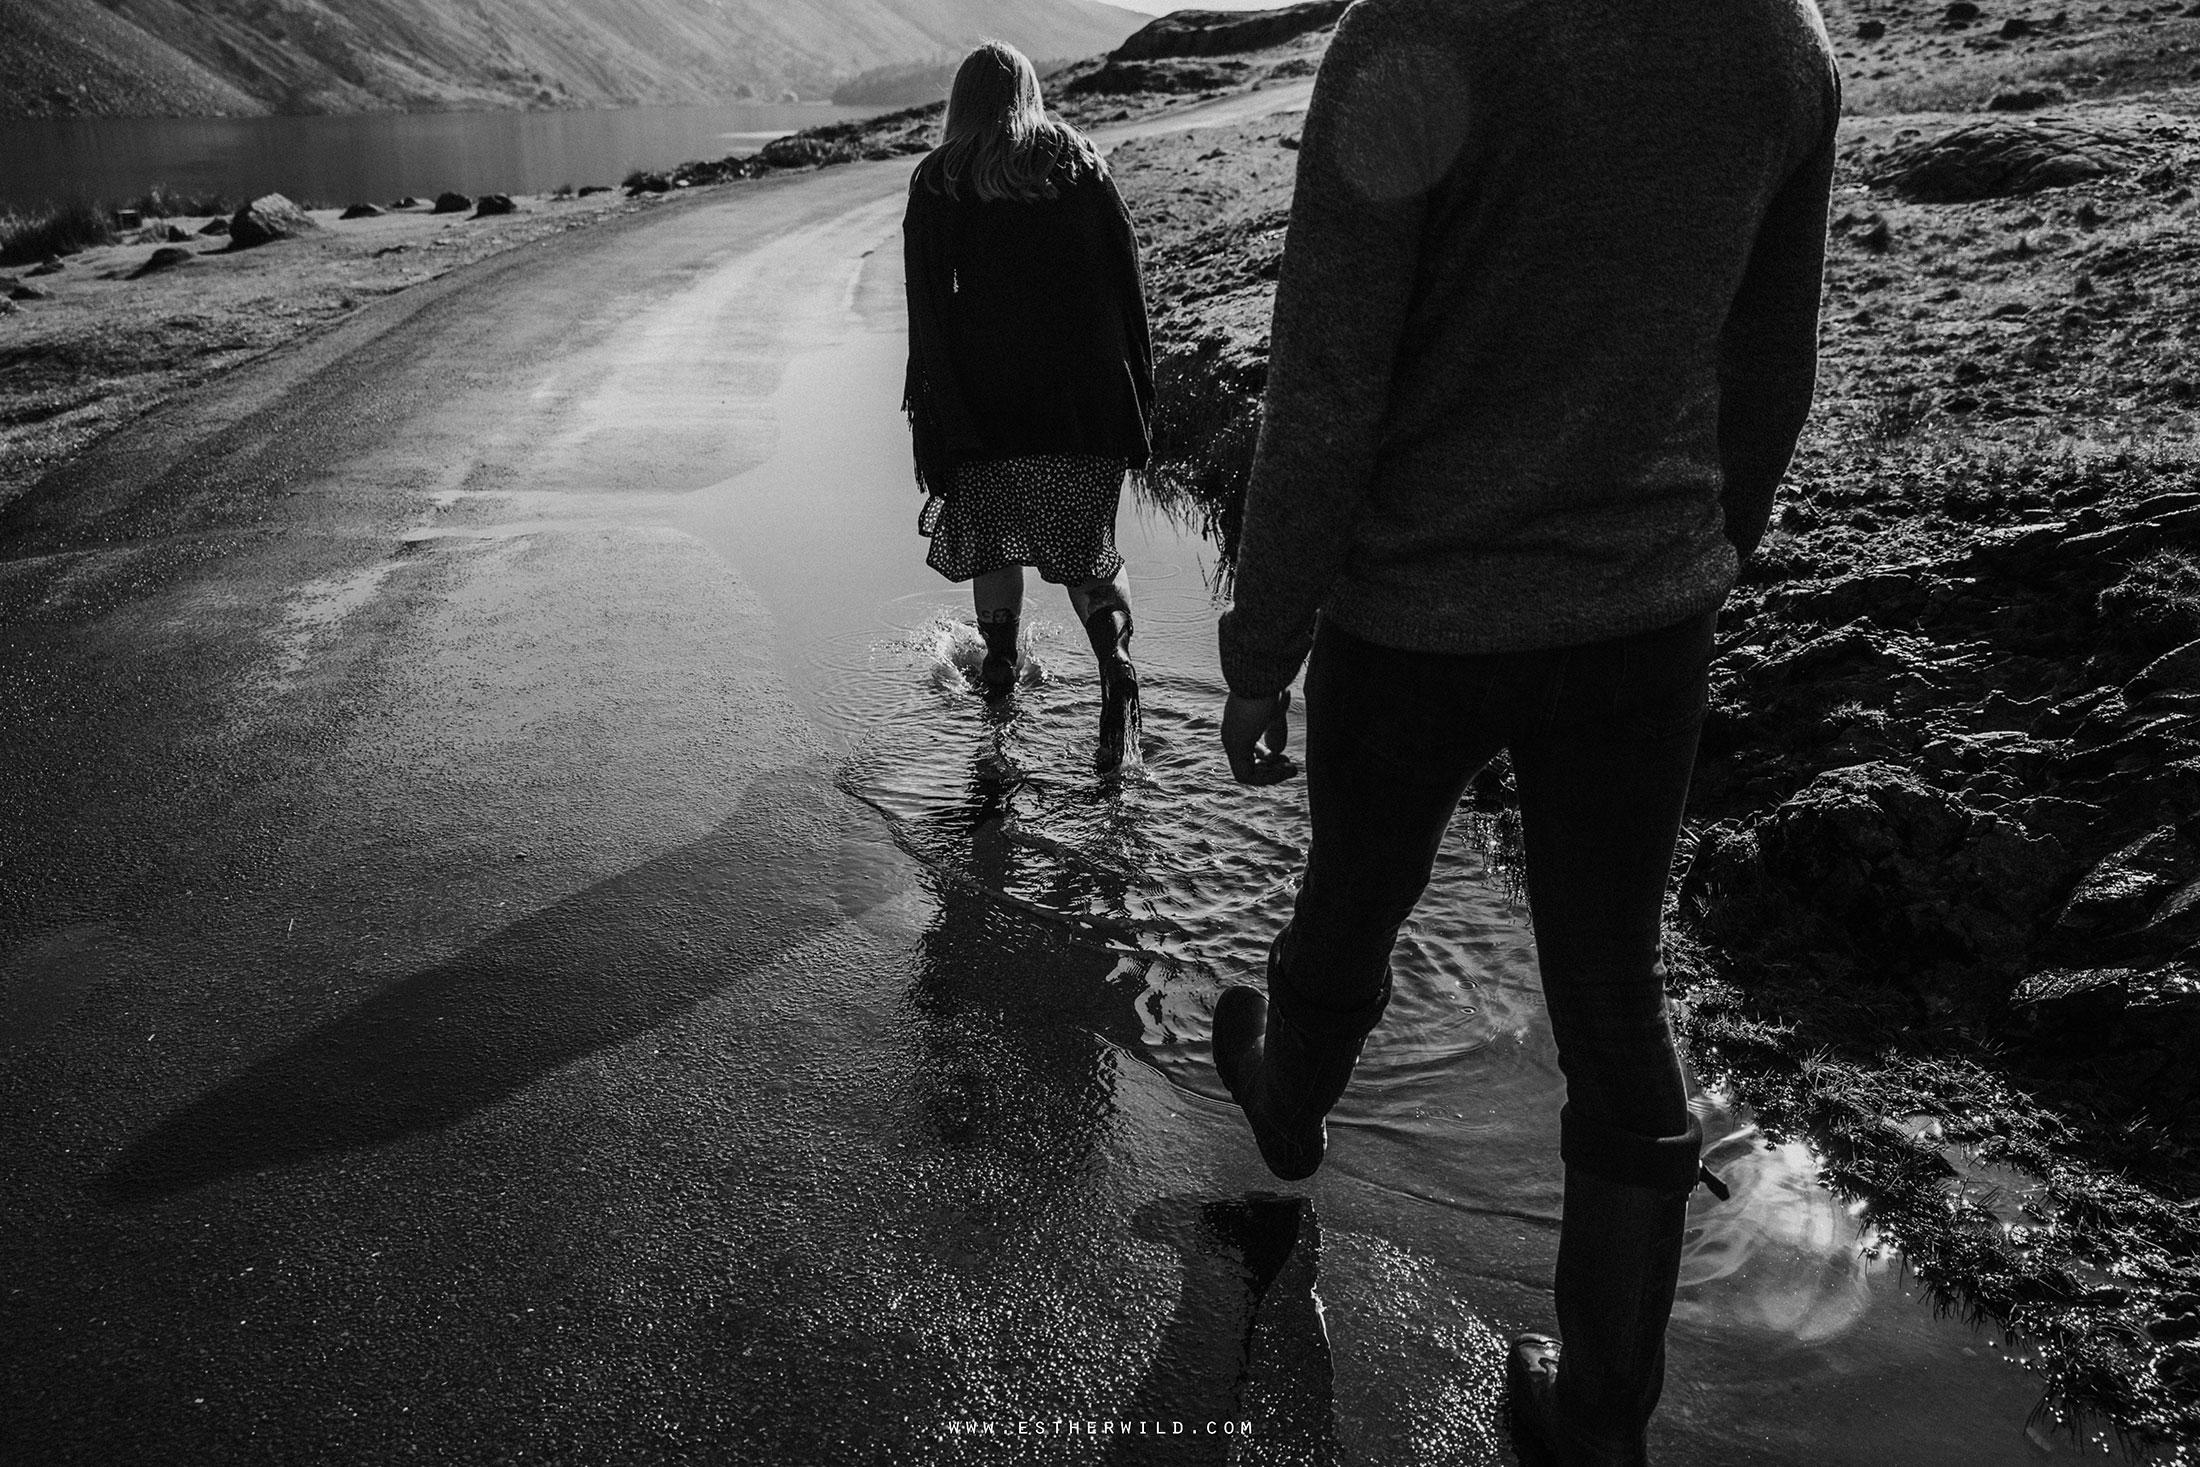 Cumbria_Lake_District_Wasdale_Wedding_Photographer_Destination_Engagement_Anniversary_Esther_Wild_IMG_3372.jpg